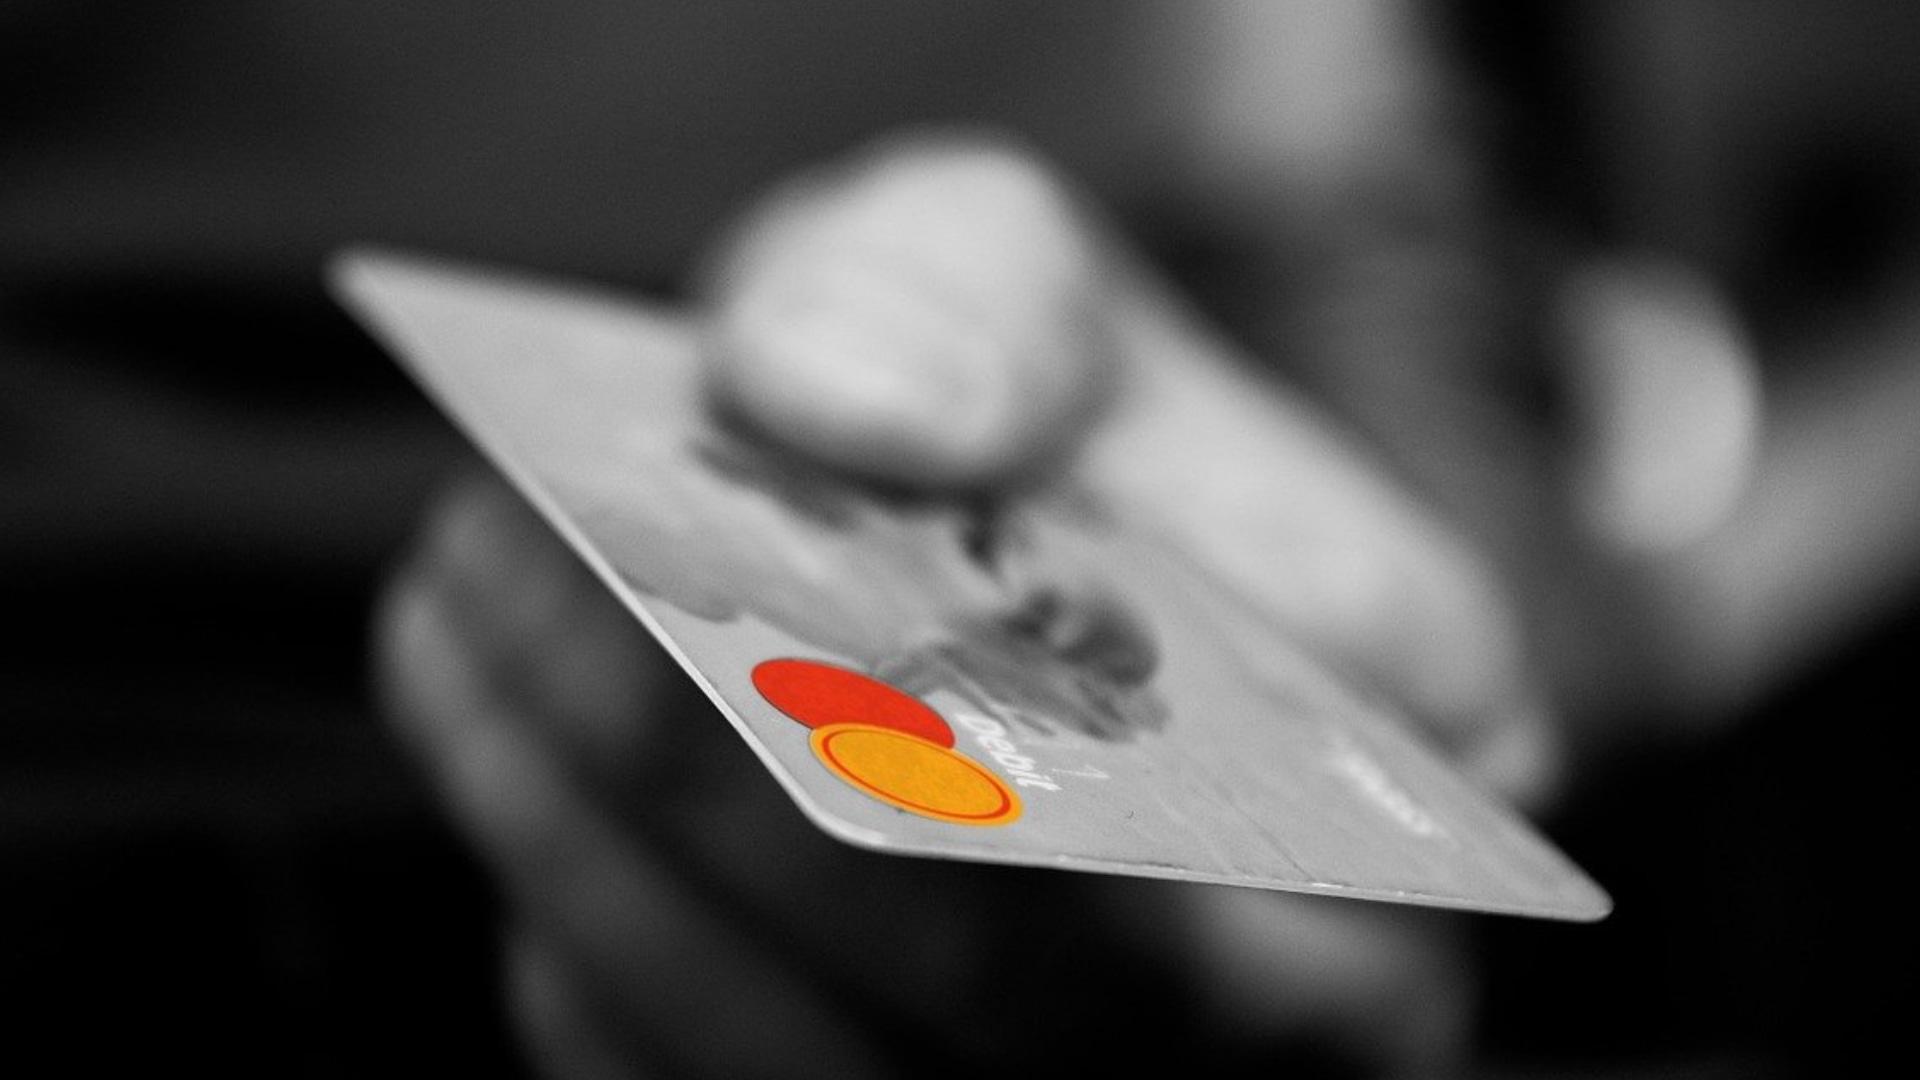 Novos empréstimos bancários para estudantes